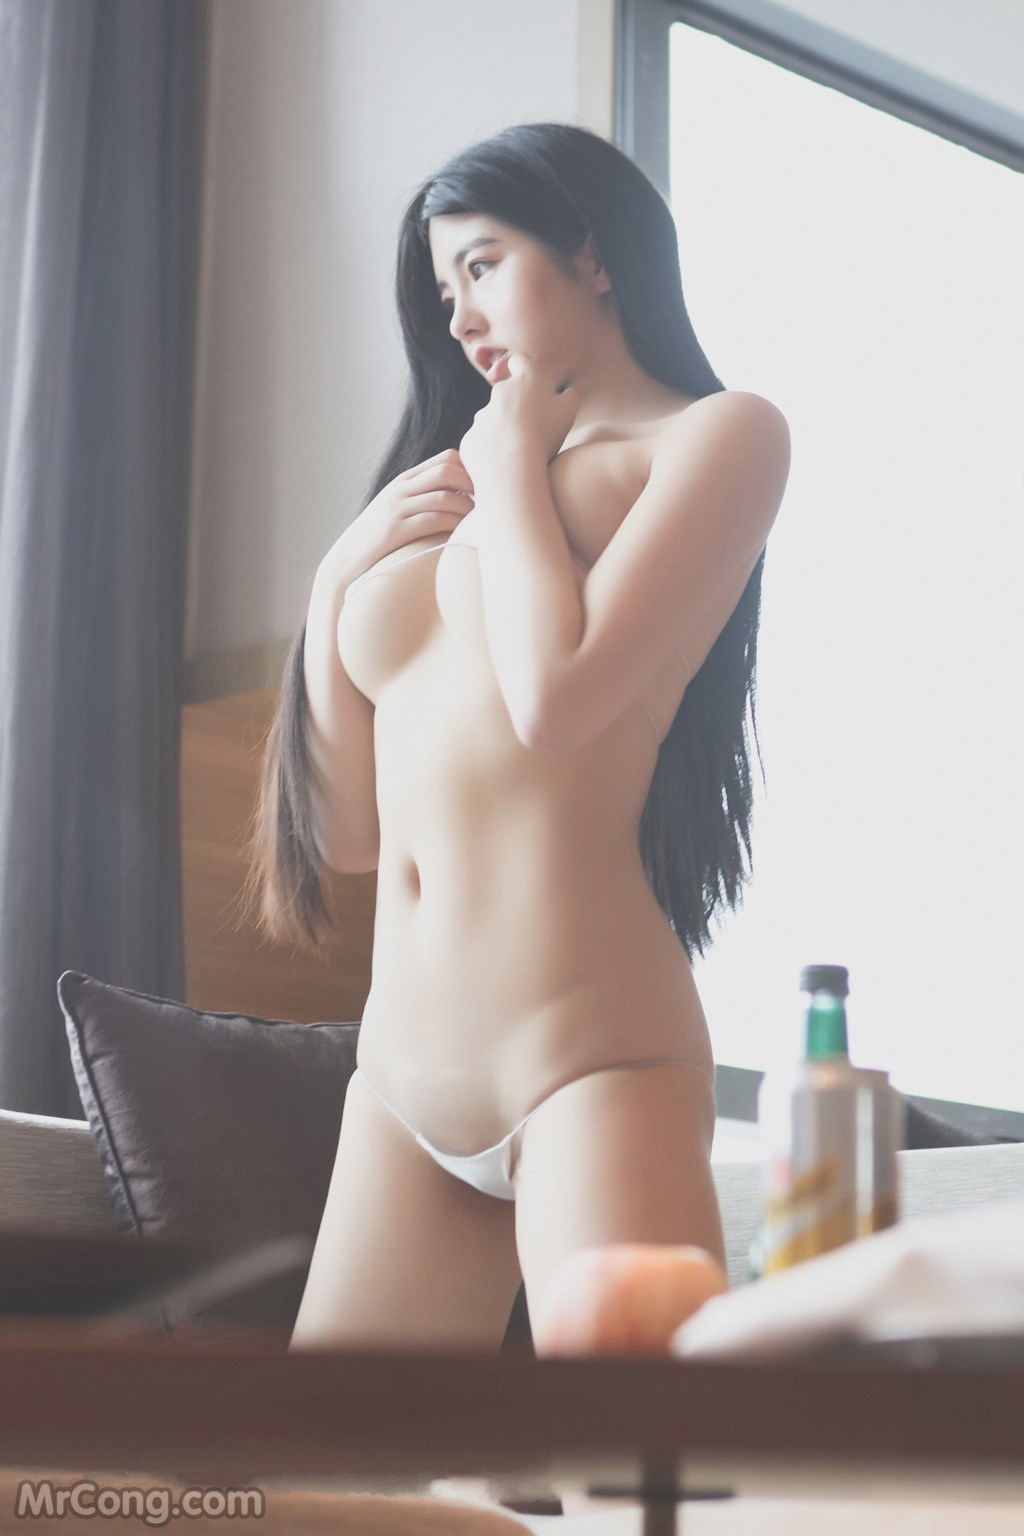 Image BoLoli-2017-06-06-Vol.066-Selena-Na-Lu-MrCong.com-016 in post BoLoli 2017-06-06 Vol.066: Người mẫu Selena (娜露) (35 ảnh)